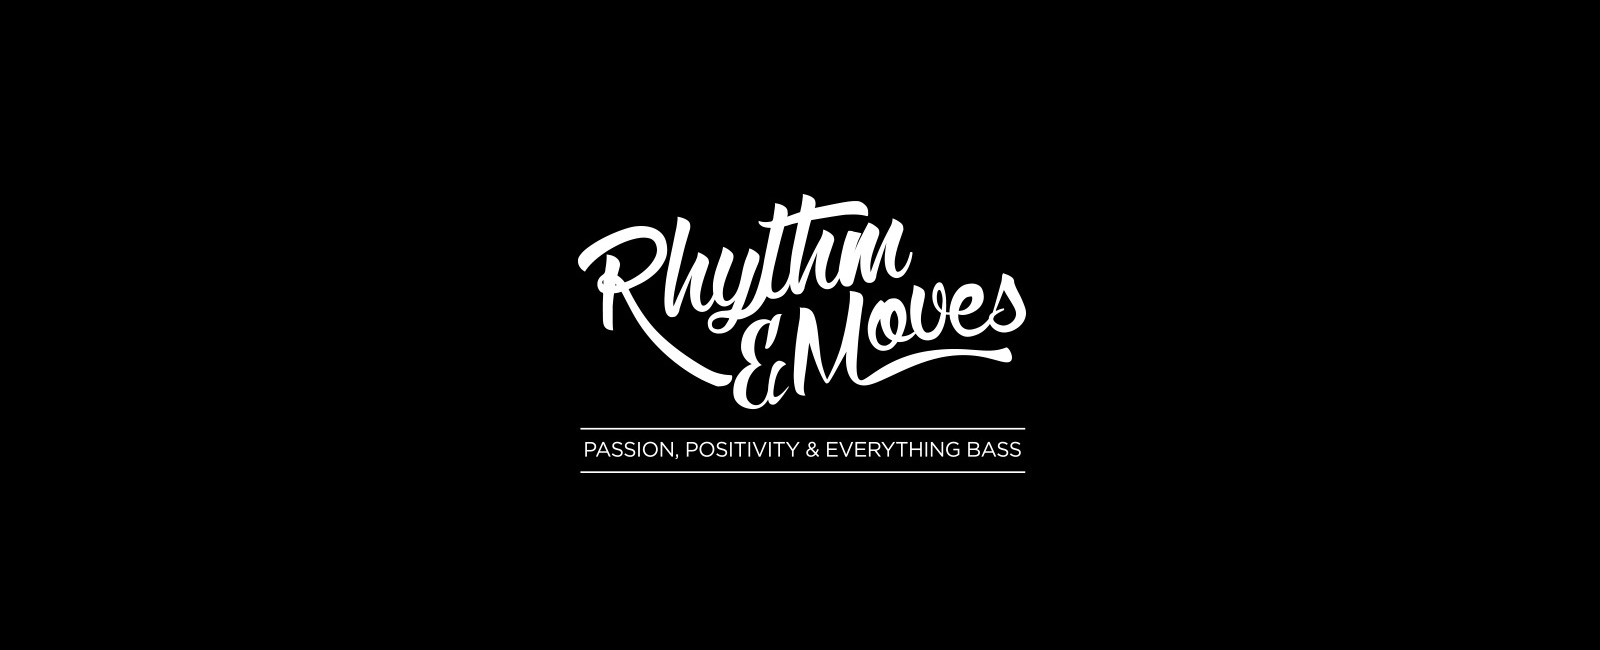 Rhythm & Moves